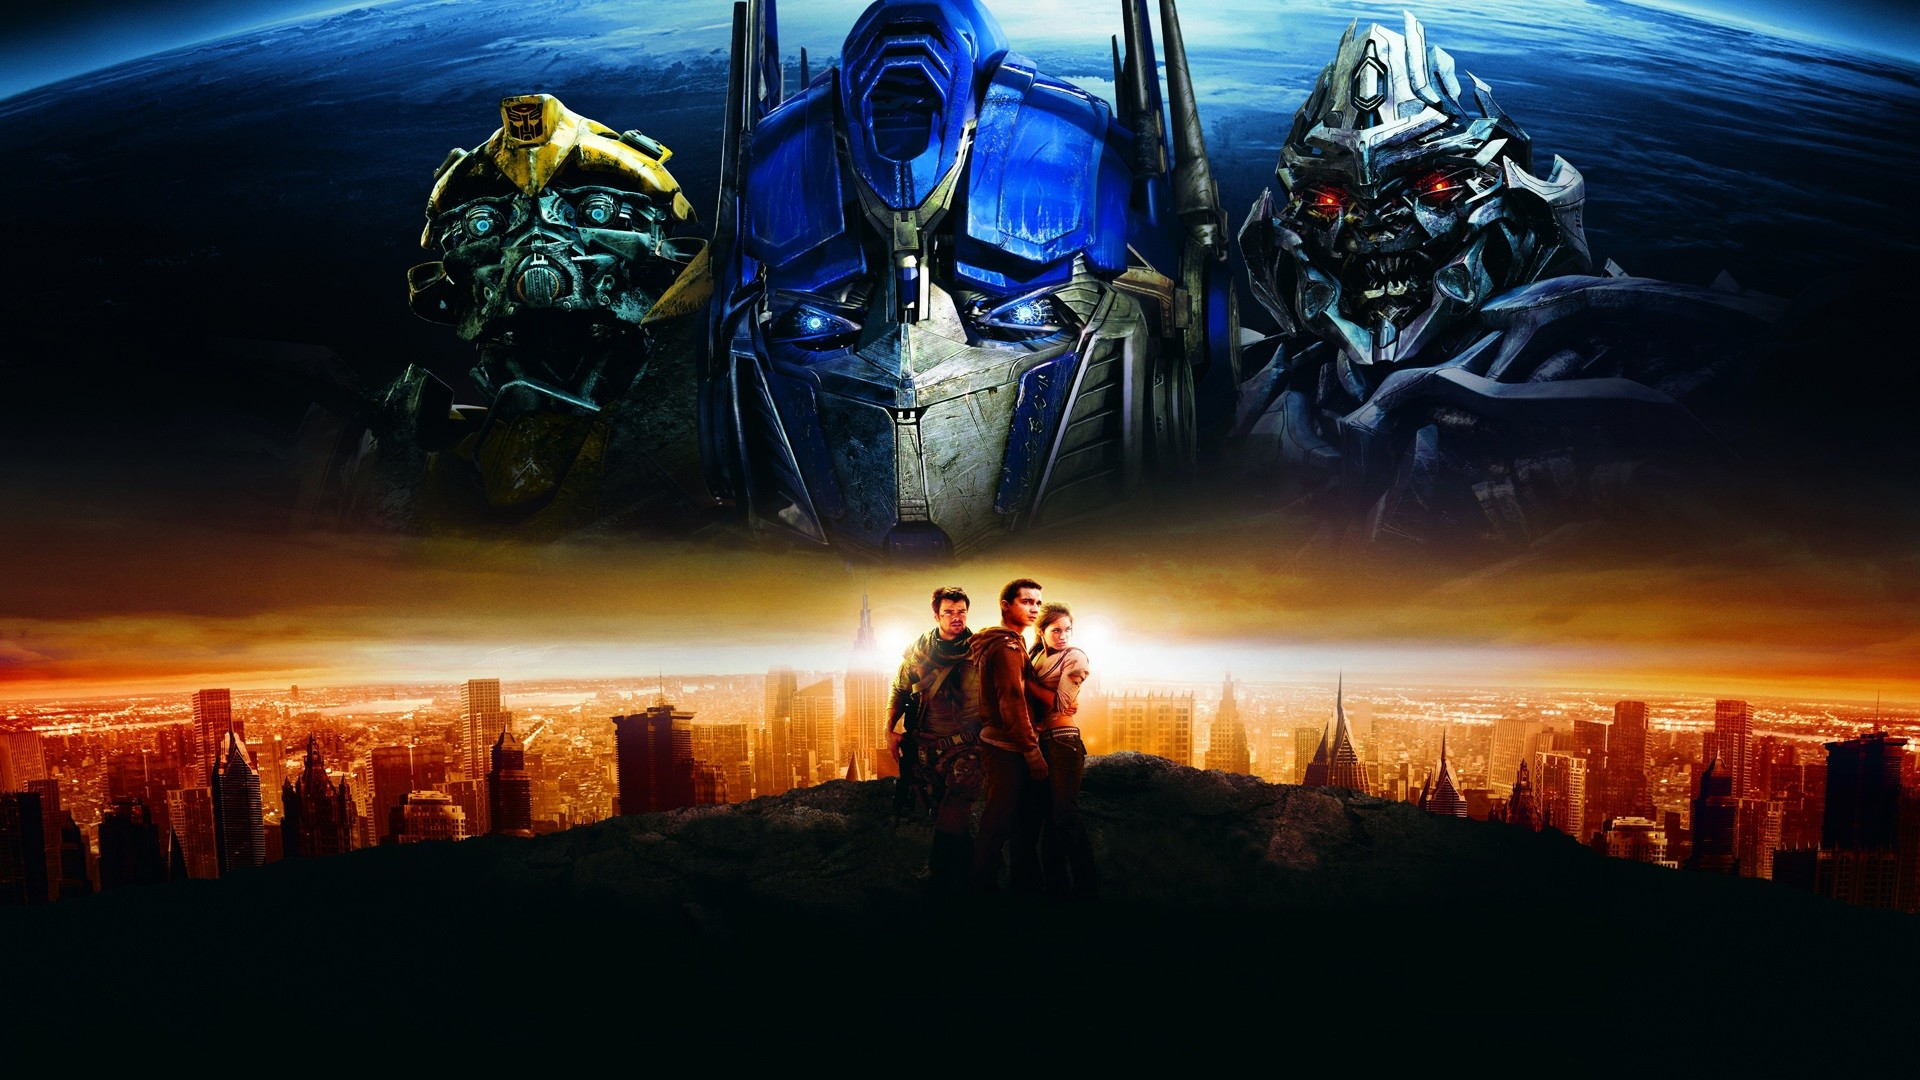 transformers 5 wallpaper 4k